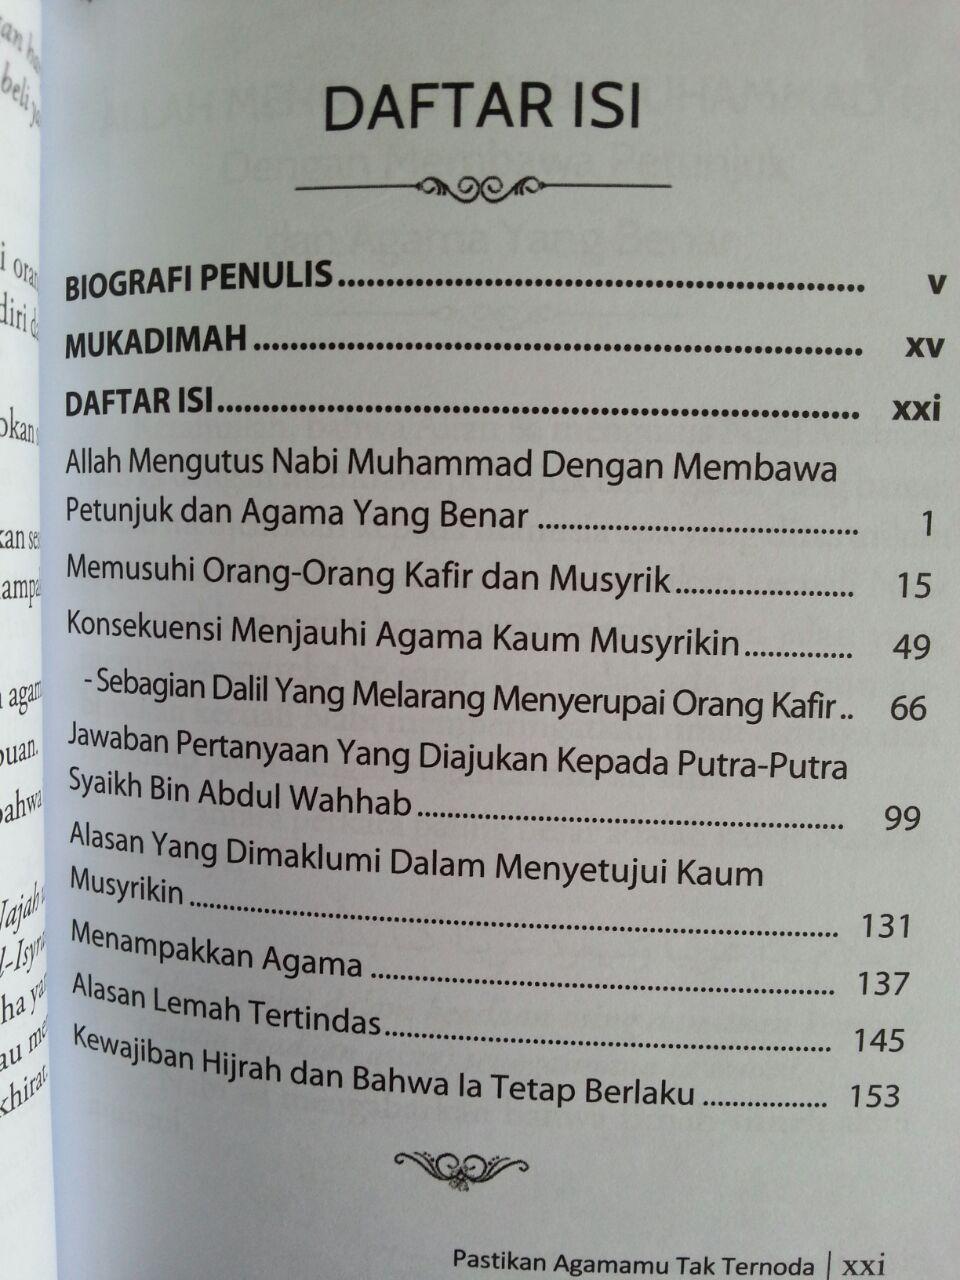 Buku Pastikan Agamamu Tak Ternoda isi 2